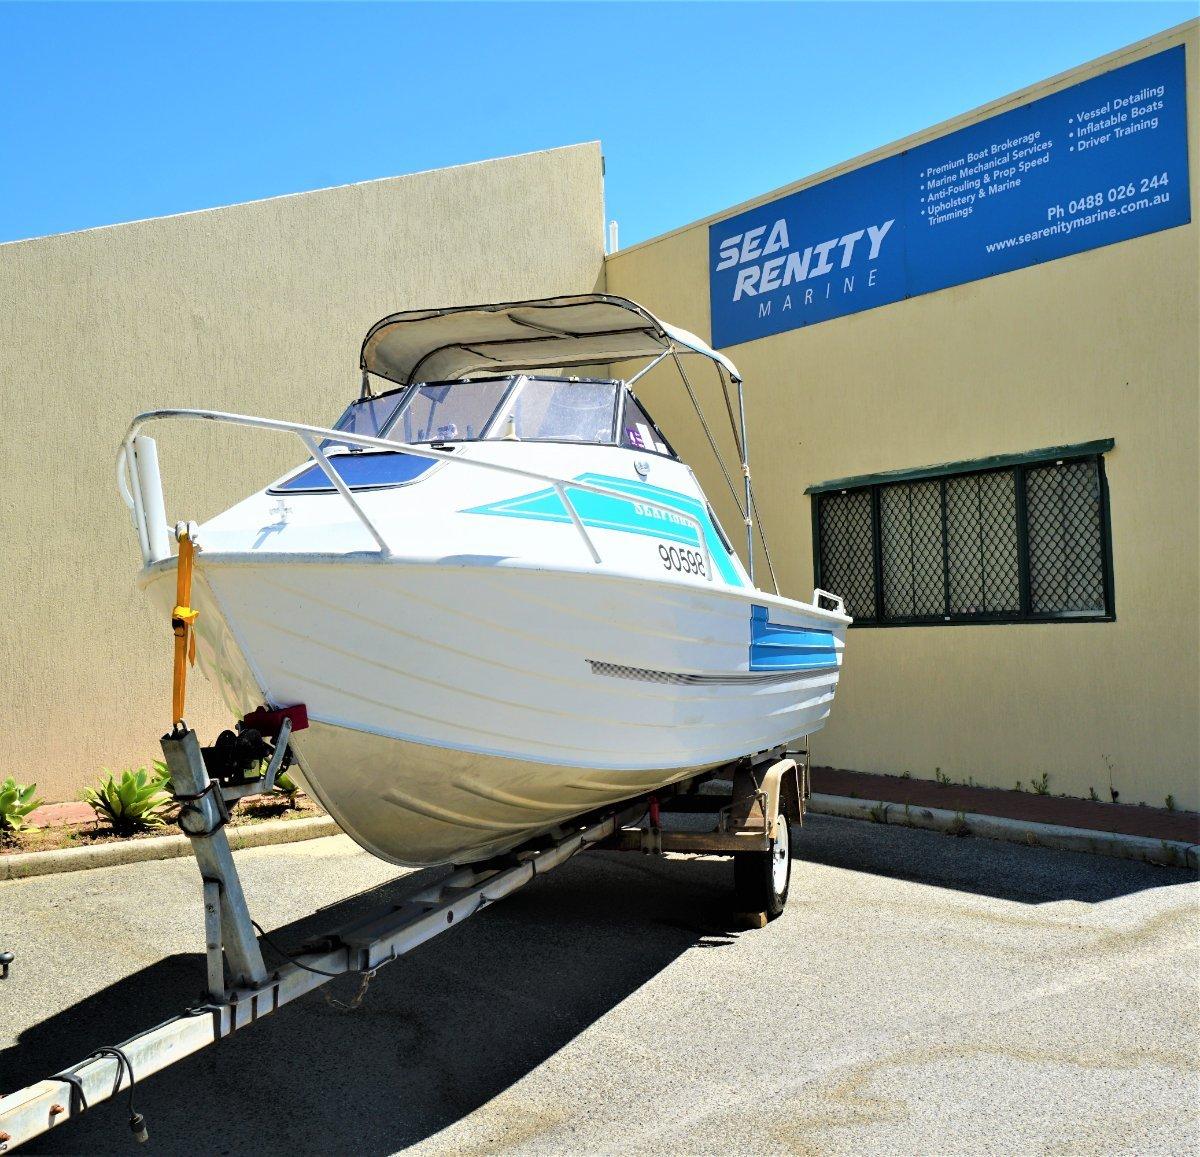 Quintrex 550 Seafisher wont last, be quick